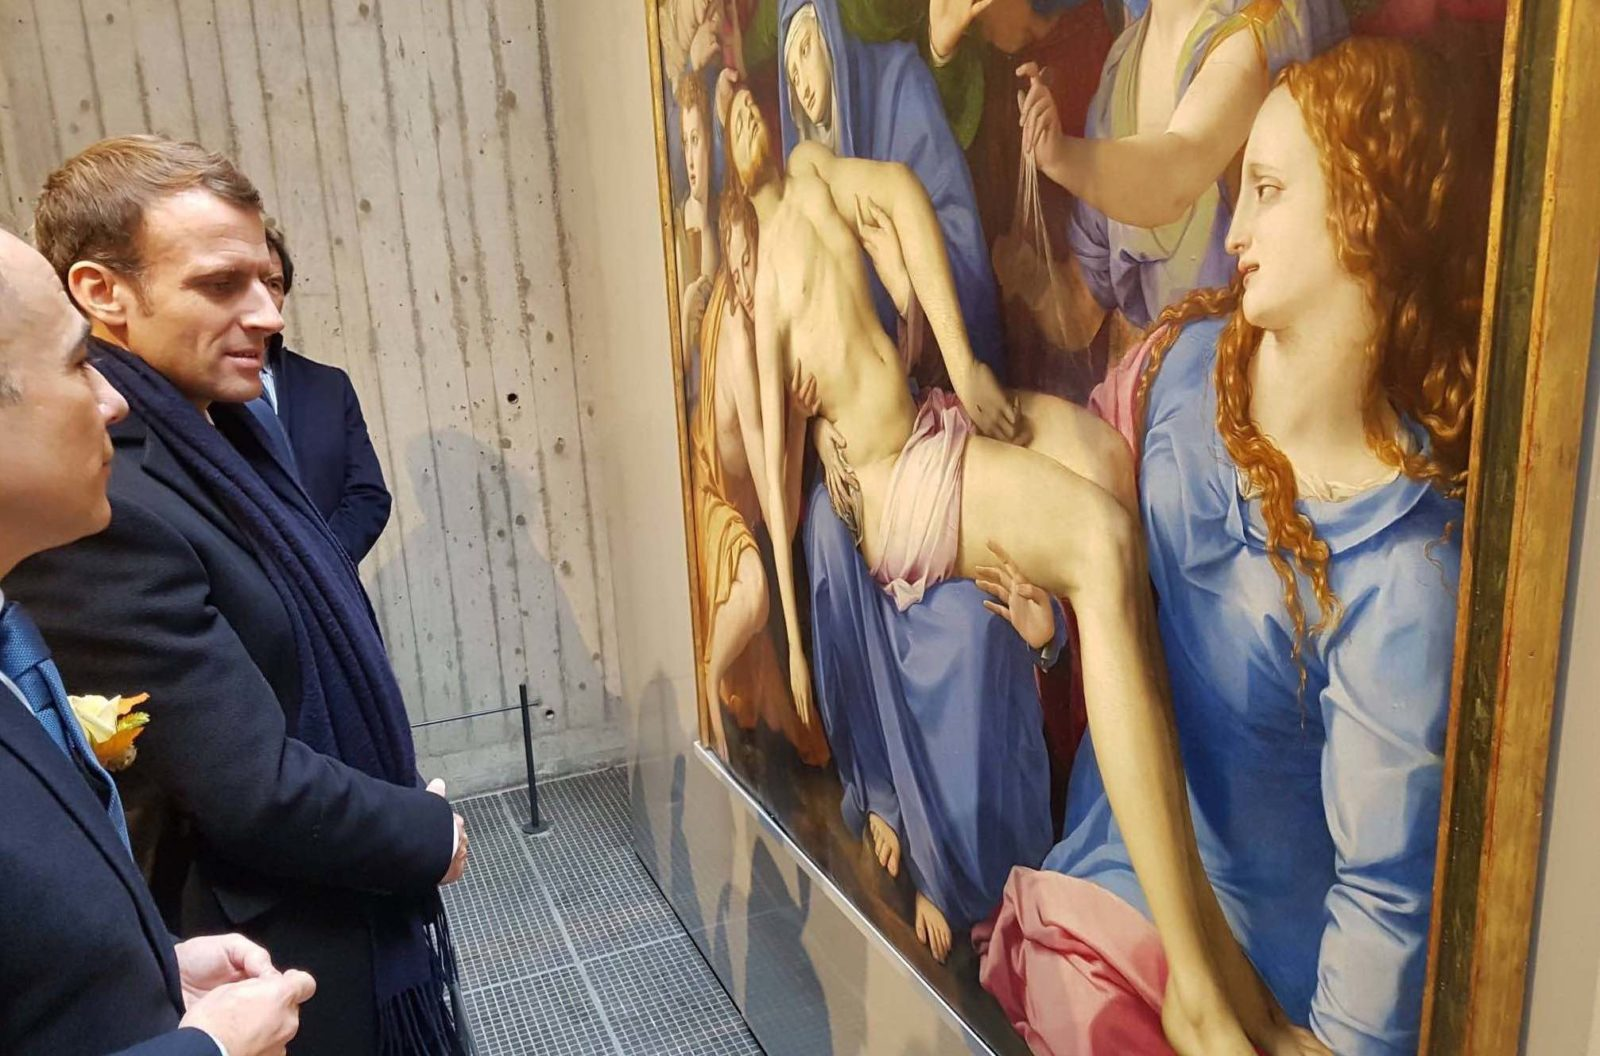 mbaa Besançon inauguration 2018 E. Macron devant tableau